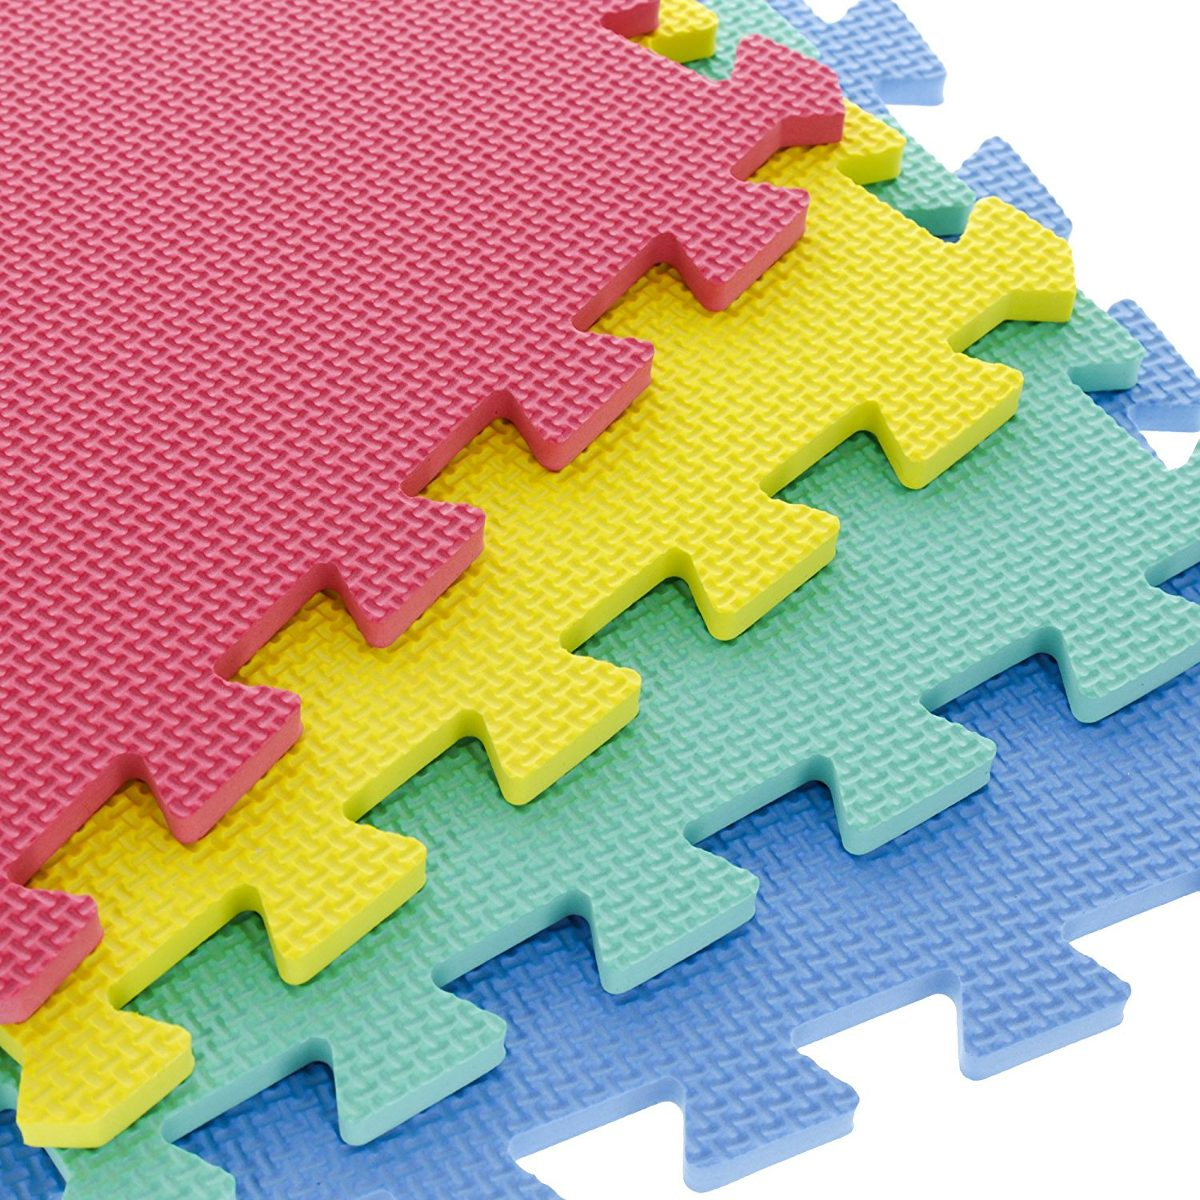 Tg Foam Mat Floor Tiles Interlocking Eva Foam Padding Por 214 999 En Mercado Libre